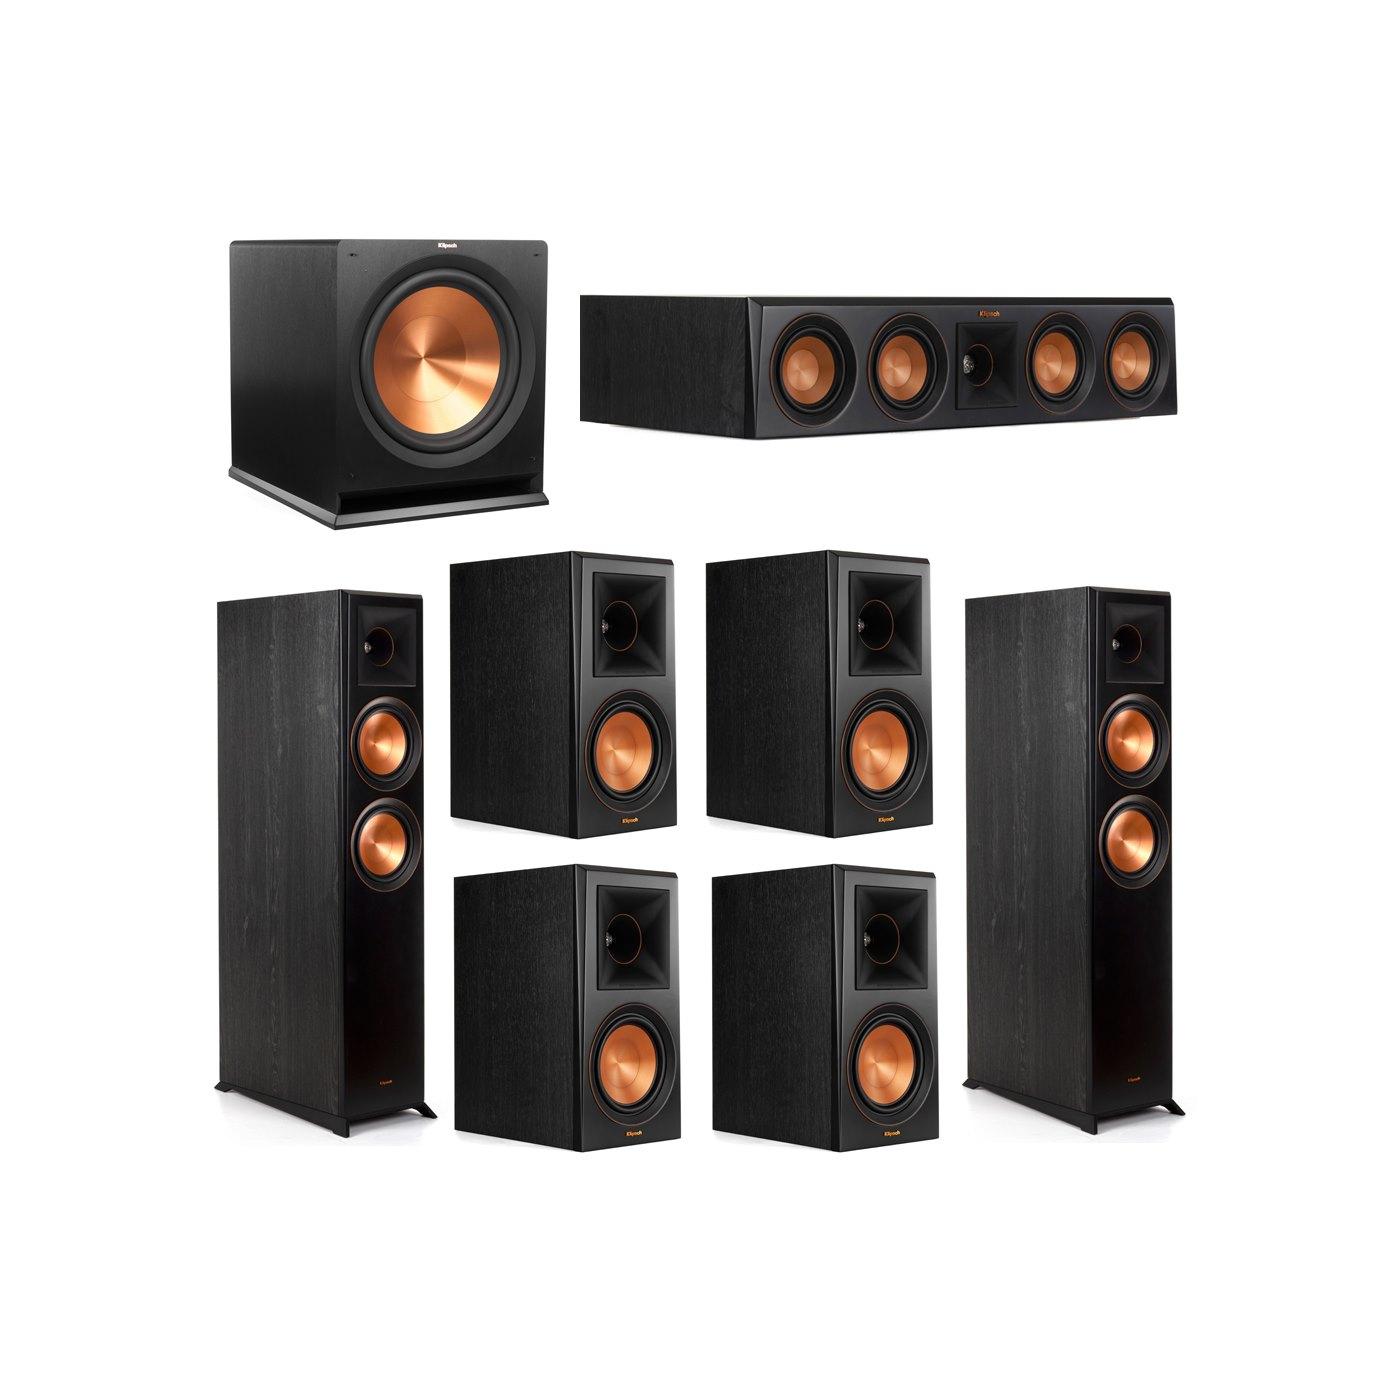 Klipsch 7.1 System with 2 RP-6000F Floorstanding Speakers, 1 Klipsch RP-404C Center Speaker, 4 Klipsch RP-600M Surround Speakers, 1 Klipsch R-115SW Subwoofer